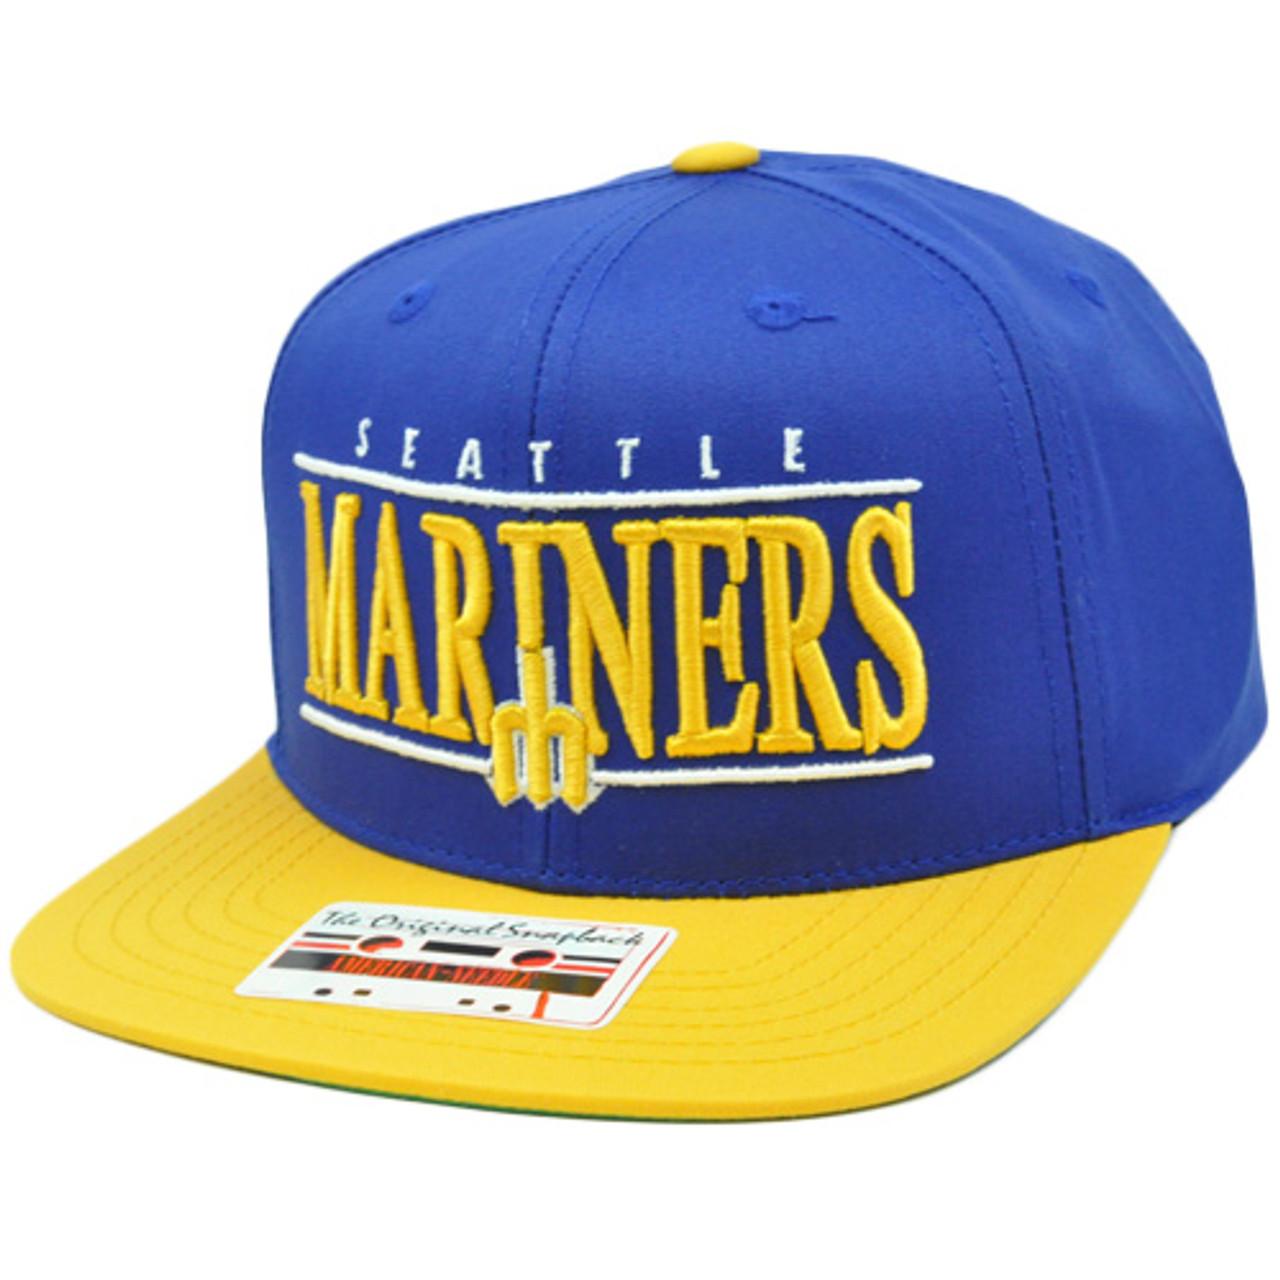 0f46d23af MLB American Needle Nineties Twill Cap Hat Snapback Flat Bill Seattle  Mariners